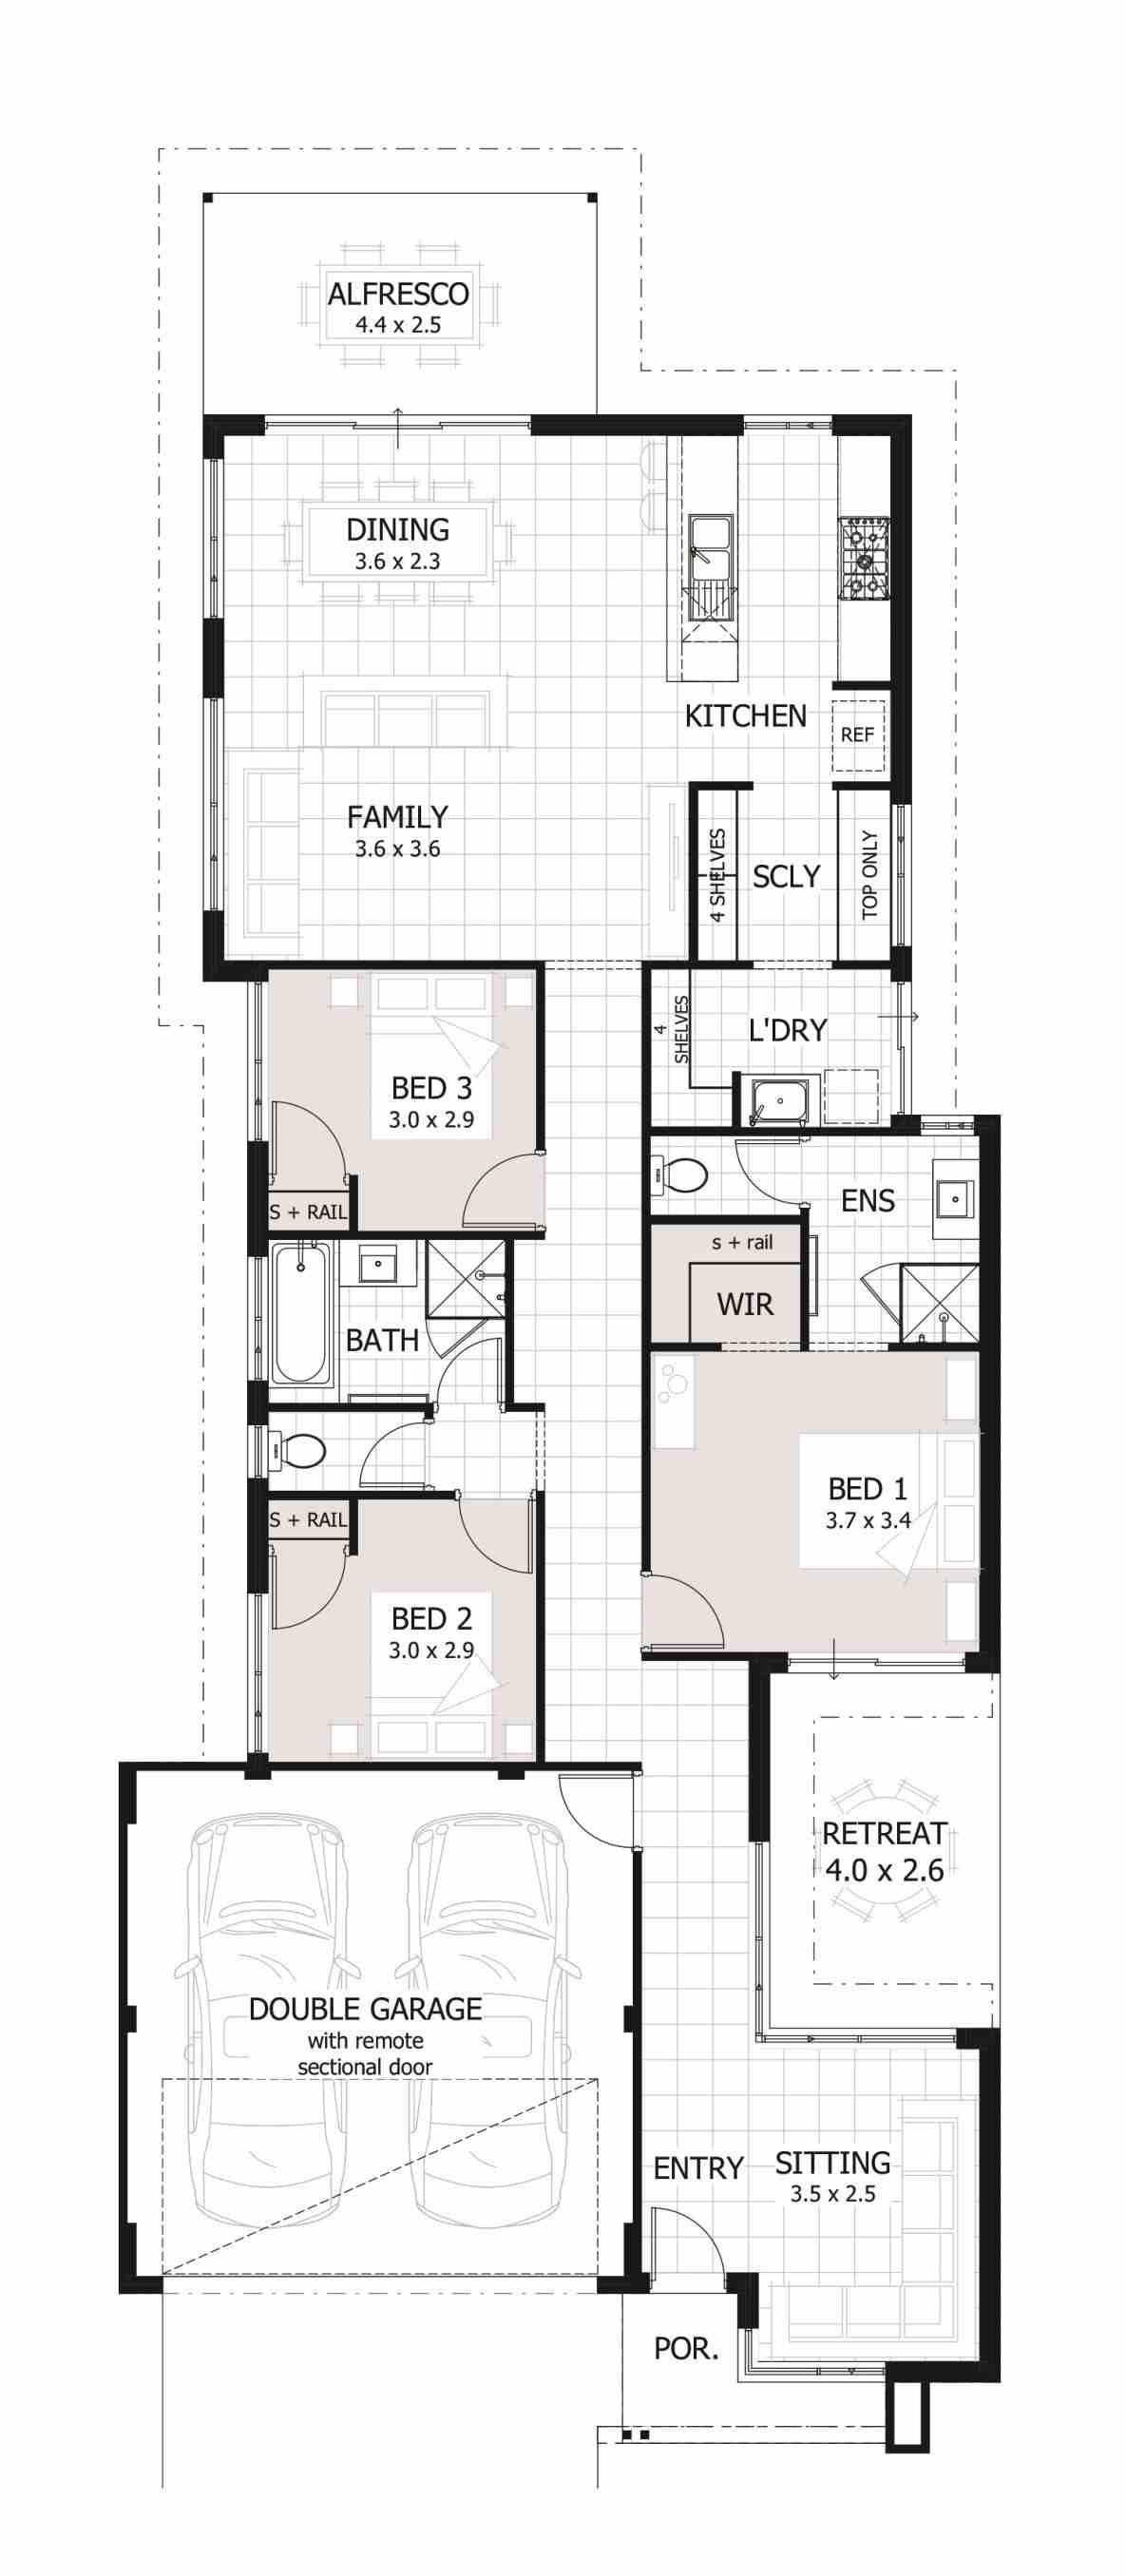 Designs Celebration Homesrhcelebrationhomescomau And Floor Interesting Three Rhclickbratislavacom Bedroom Bat House Plans Garage House Plans Small House Plans